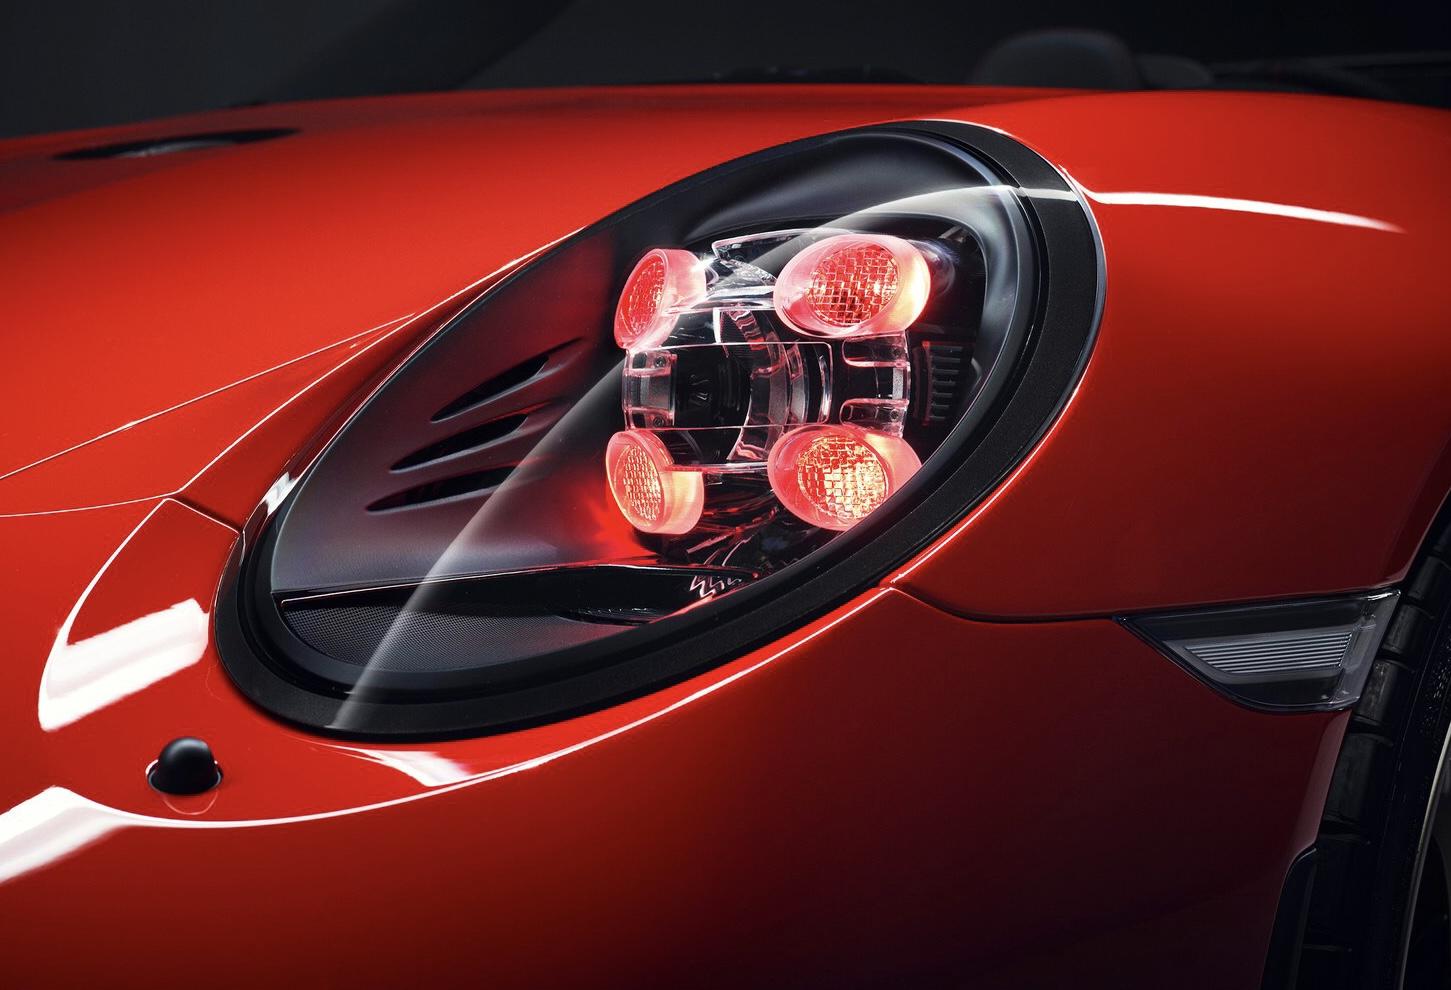 Òptica del Porsche 911 Speedster